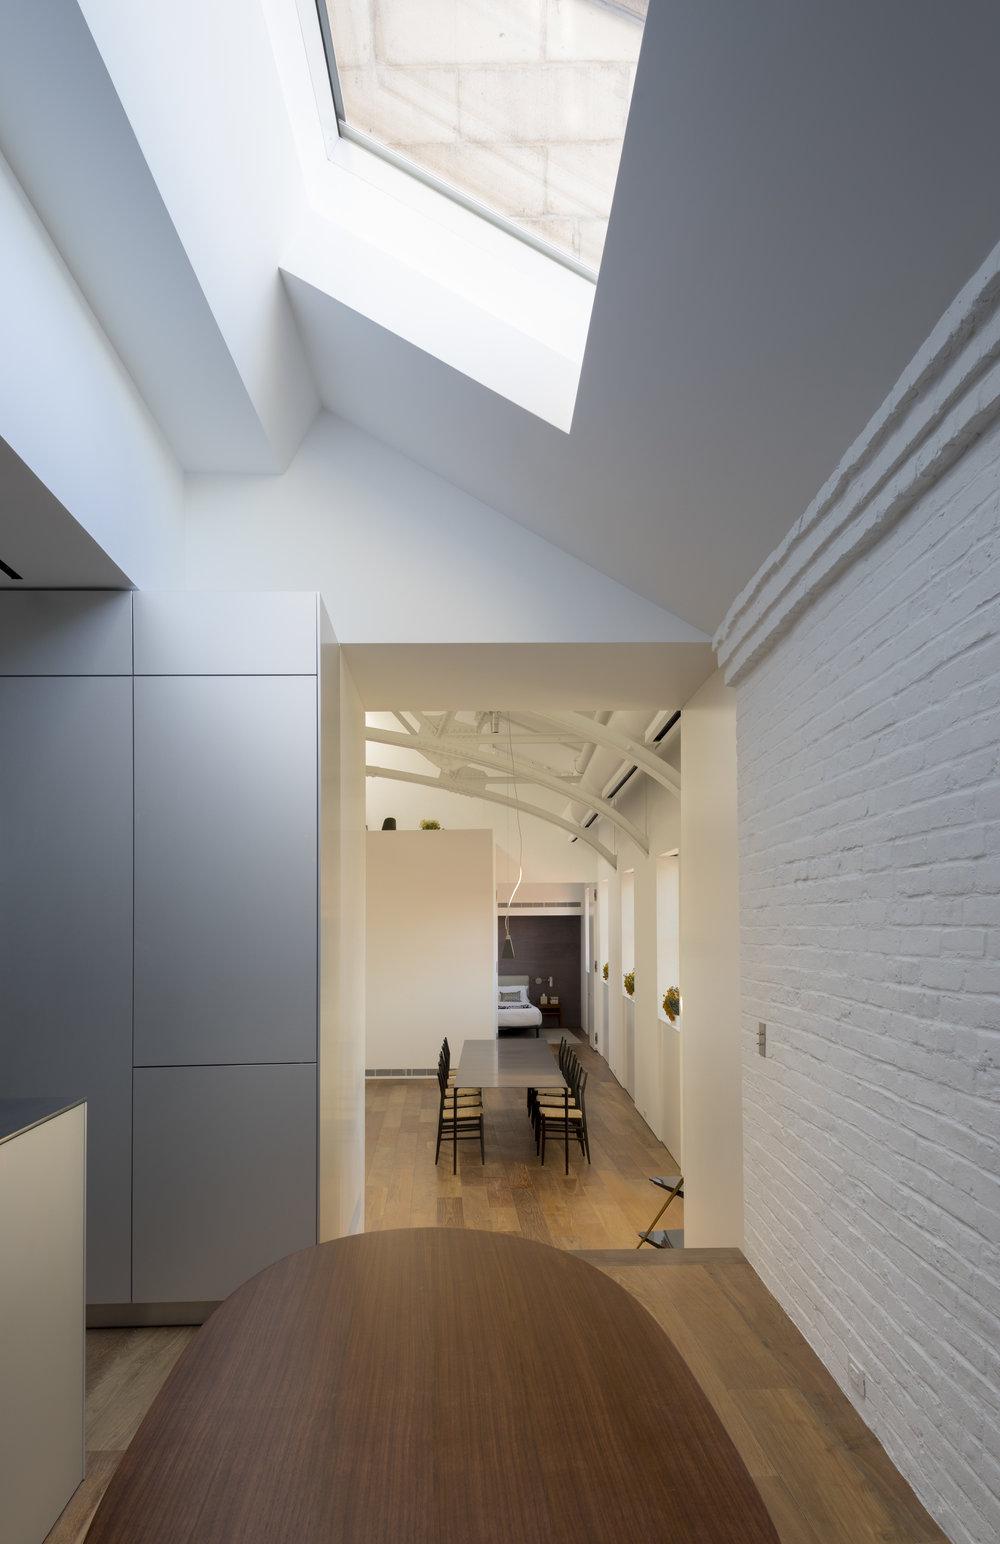 Police-Building-Apartment_Selldorf-Architects_Nicholas-Venezia_06.jpg